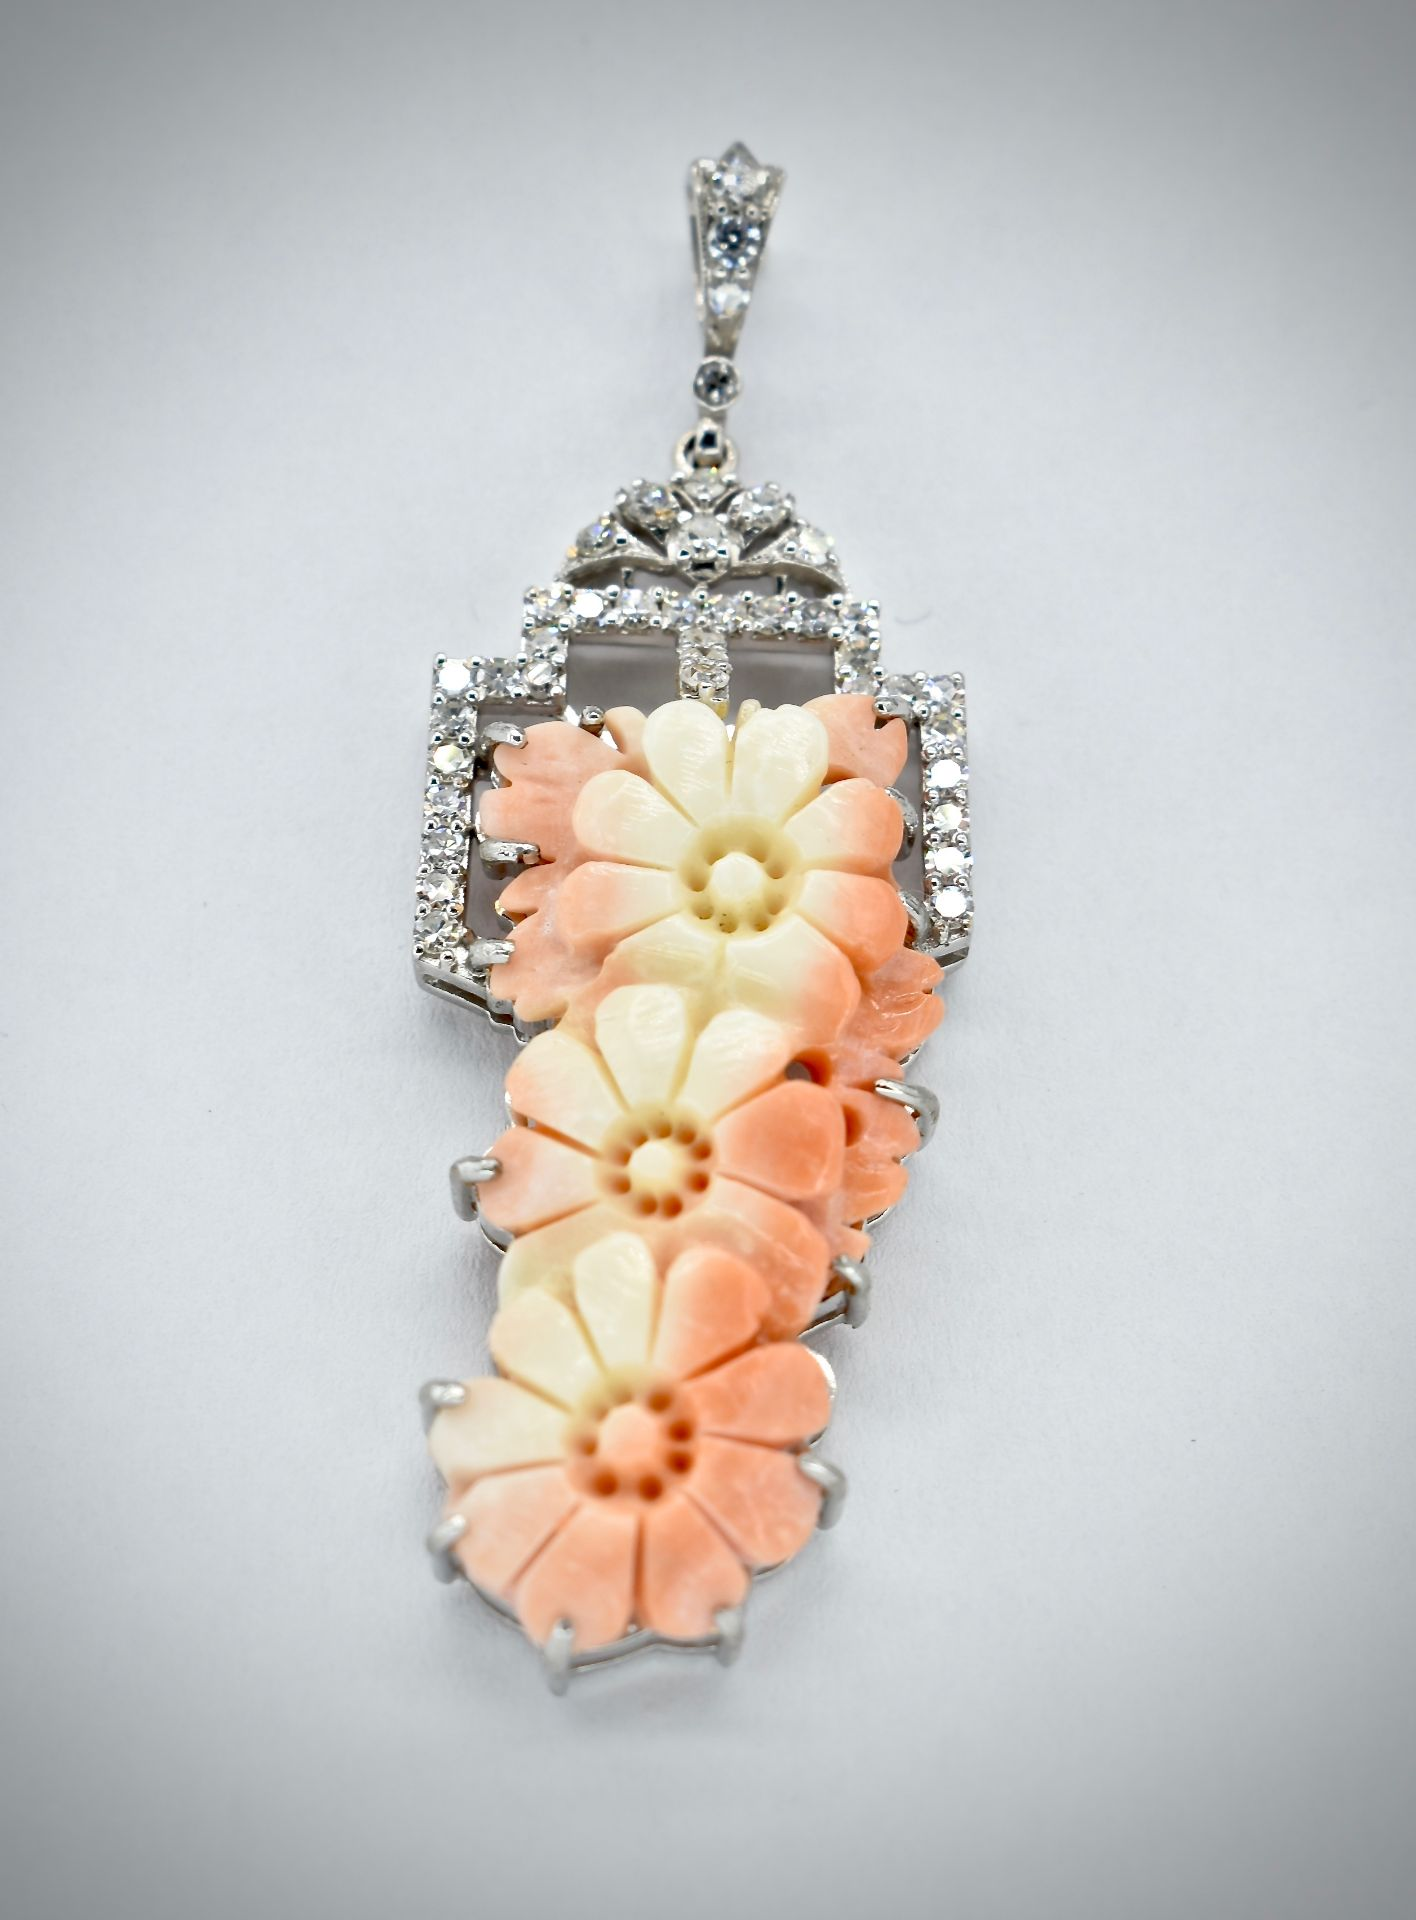 18ct Gold Coral & Diamond Necklace Pendant